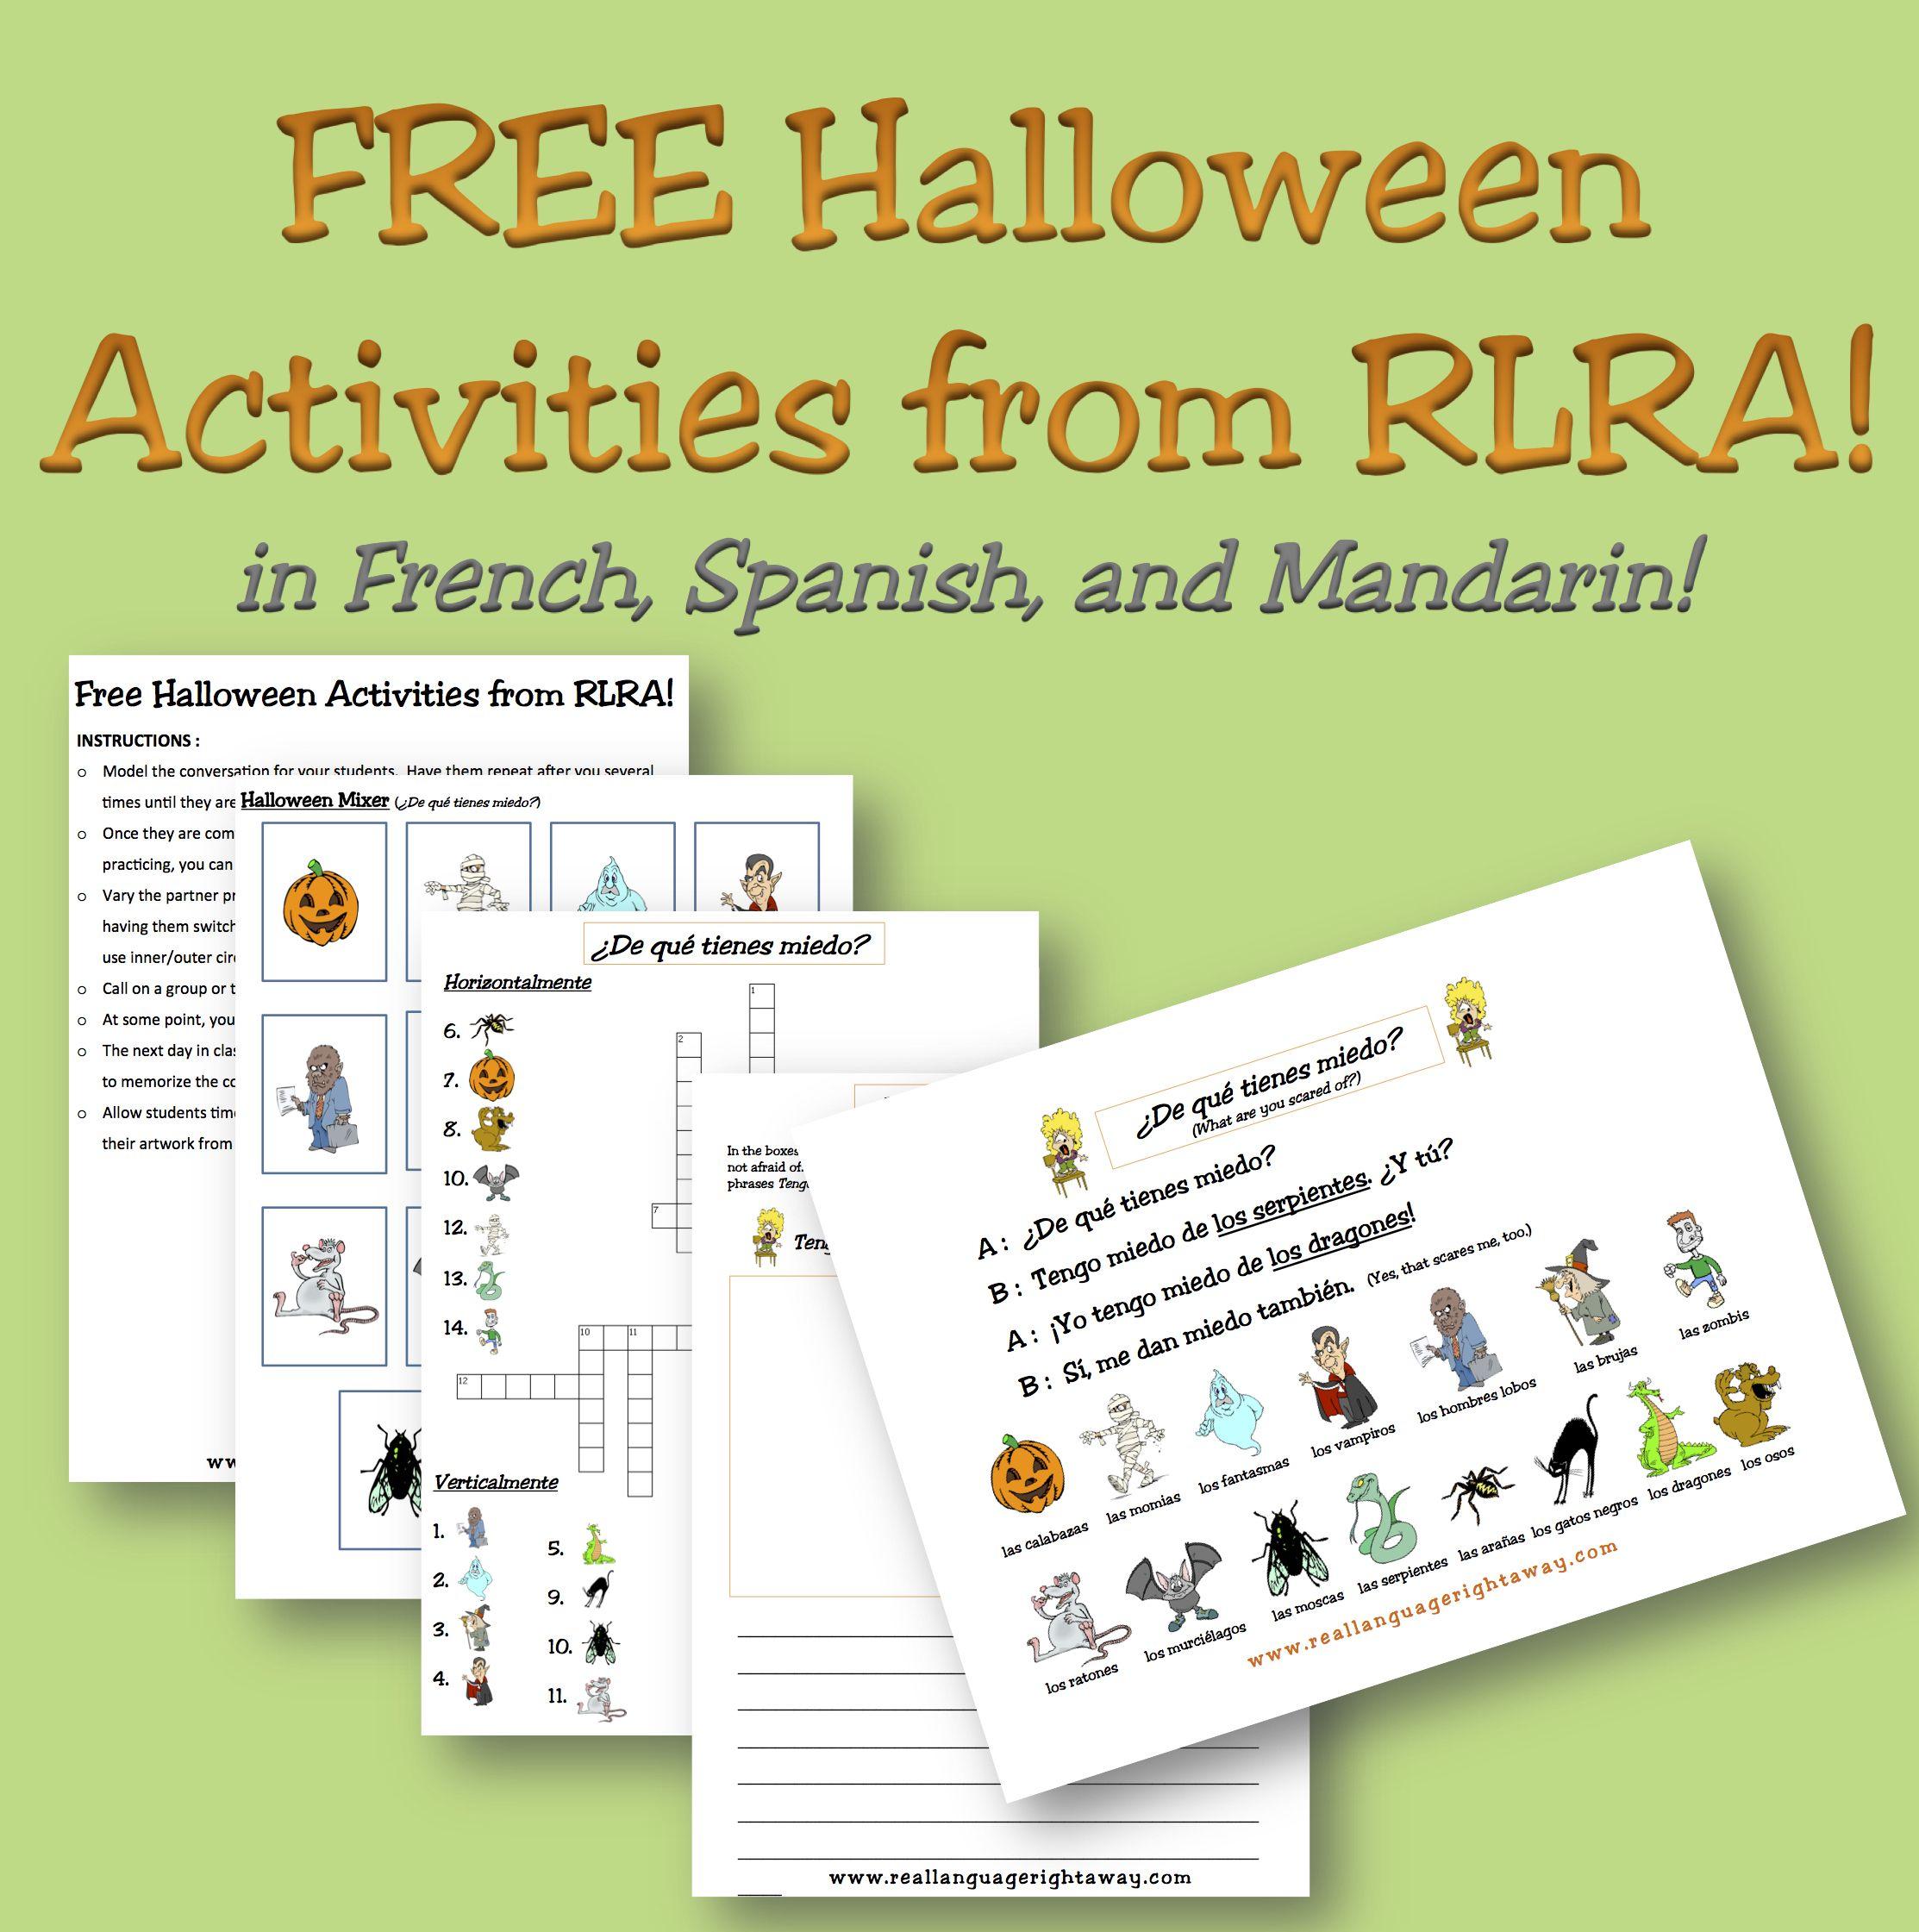 Free Halloween Activities in French, Spanish, and Mandarin